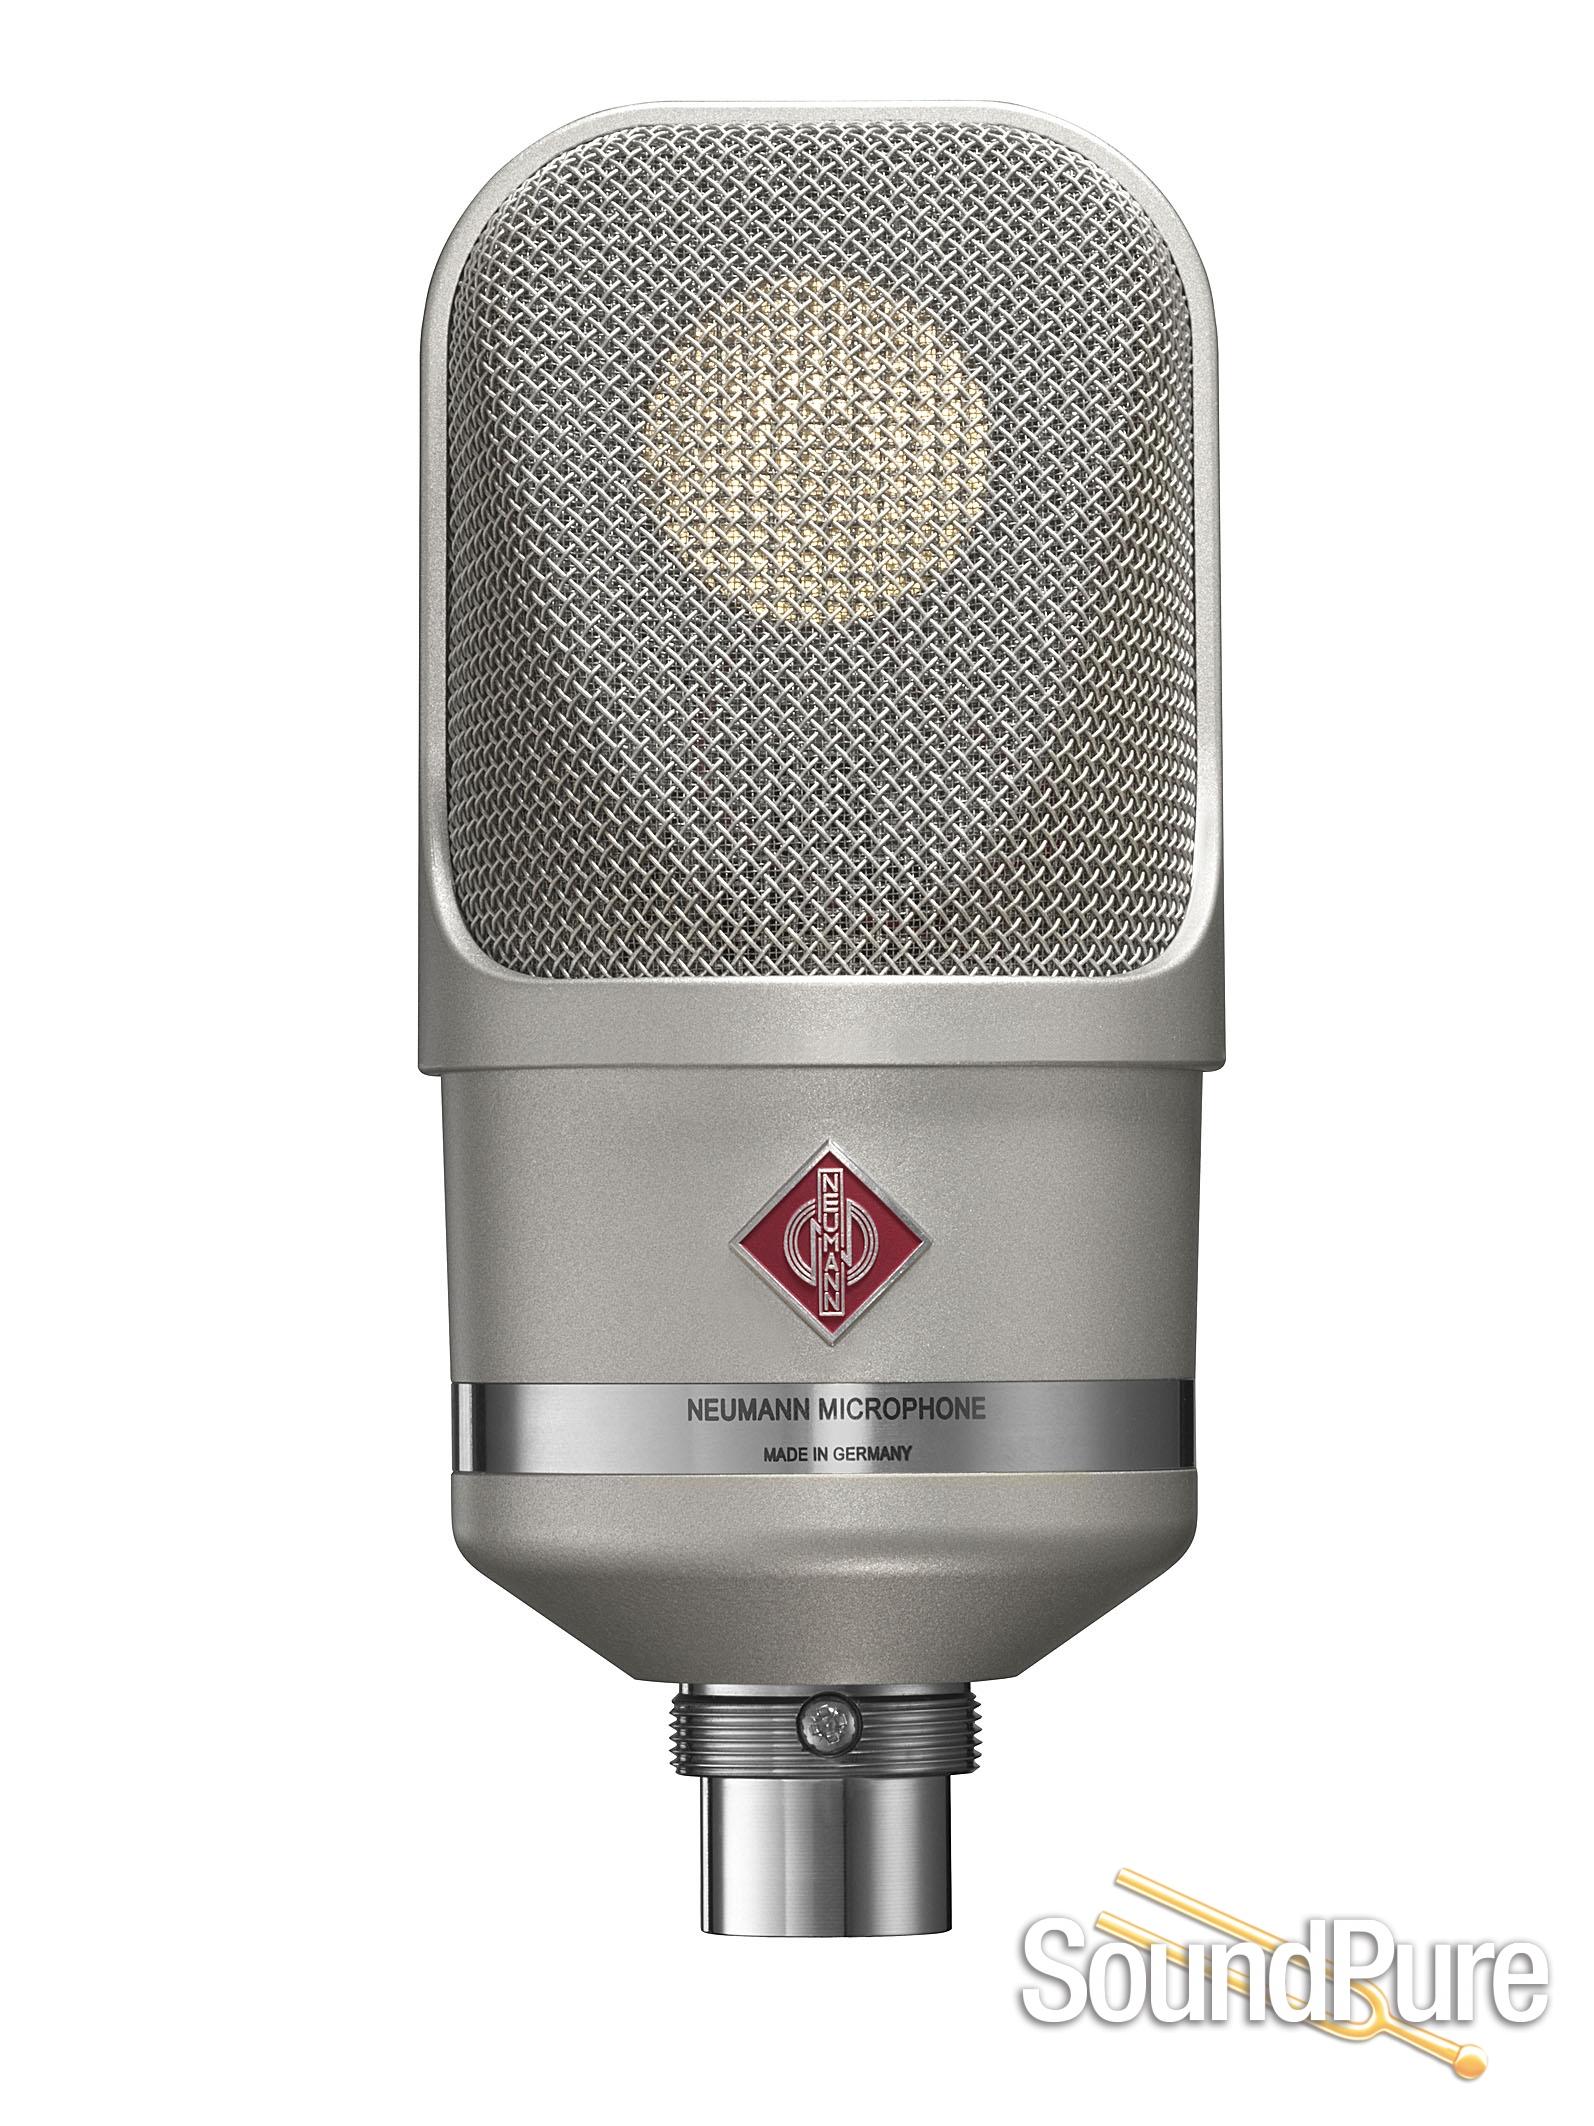 Neumann Tlm 107 Nickel Multi Pattern Ldc Microphone Circuit Design Reproduce Sound Signals Captured Through A